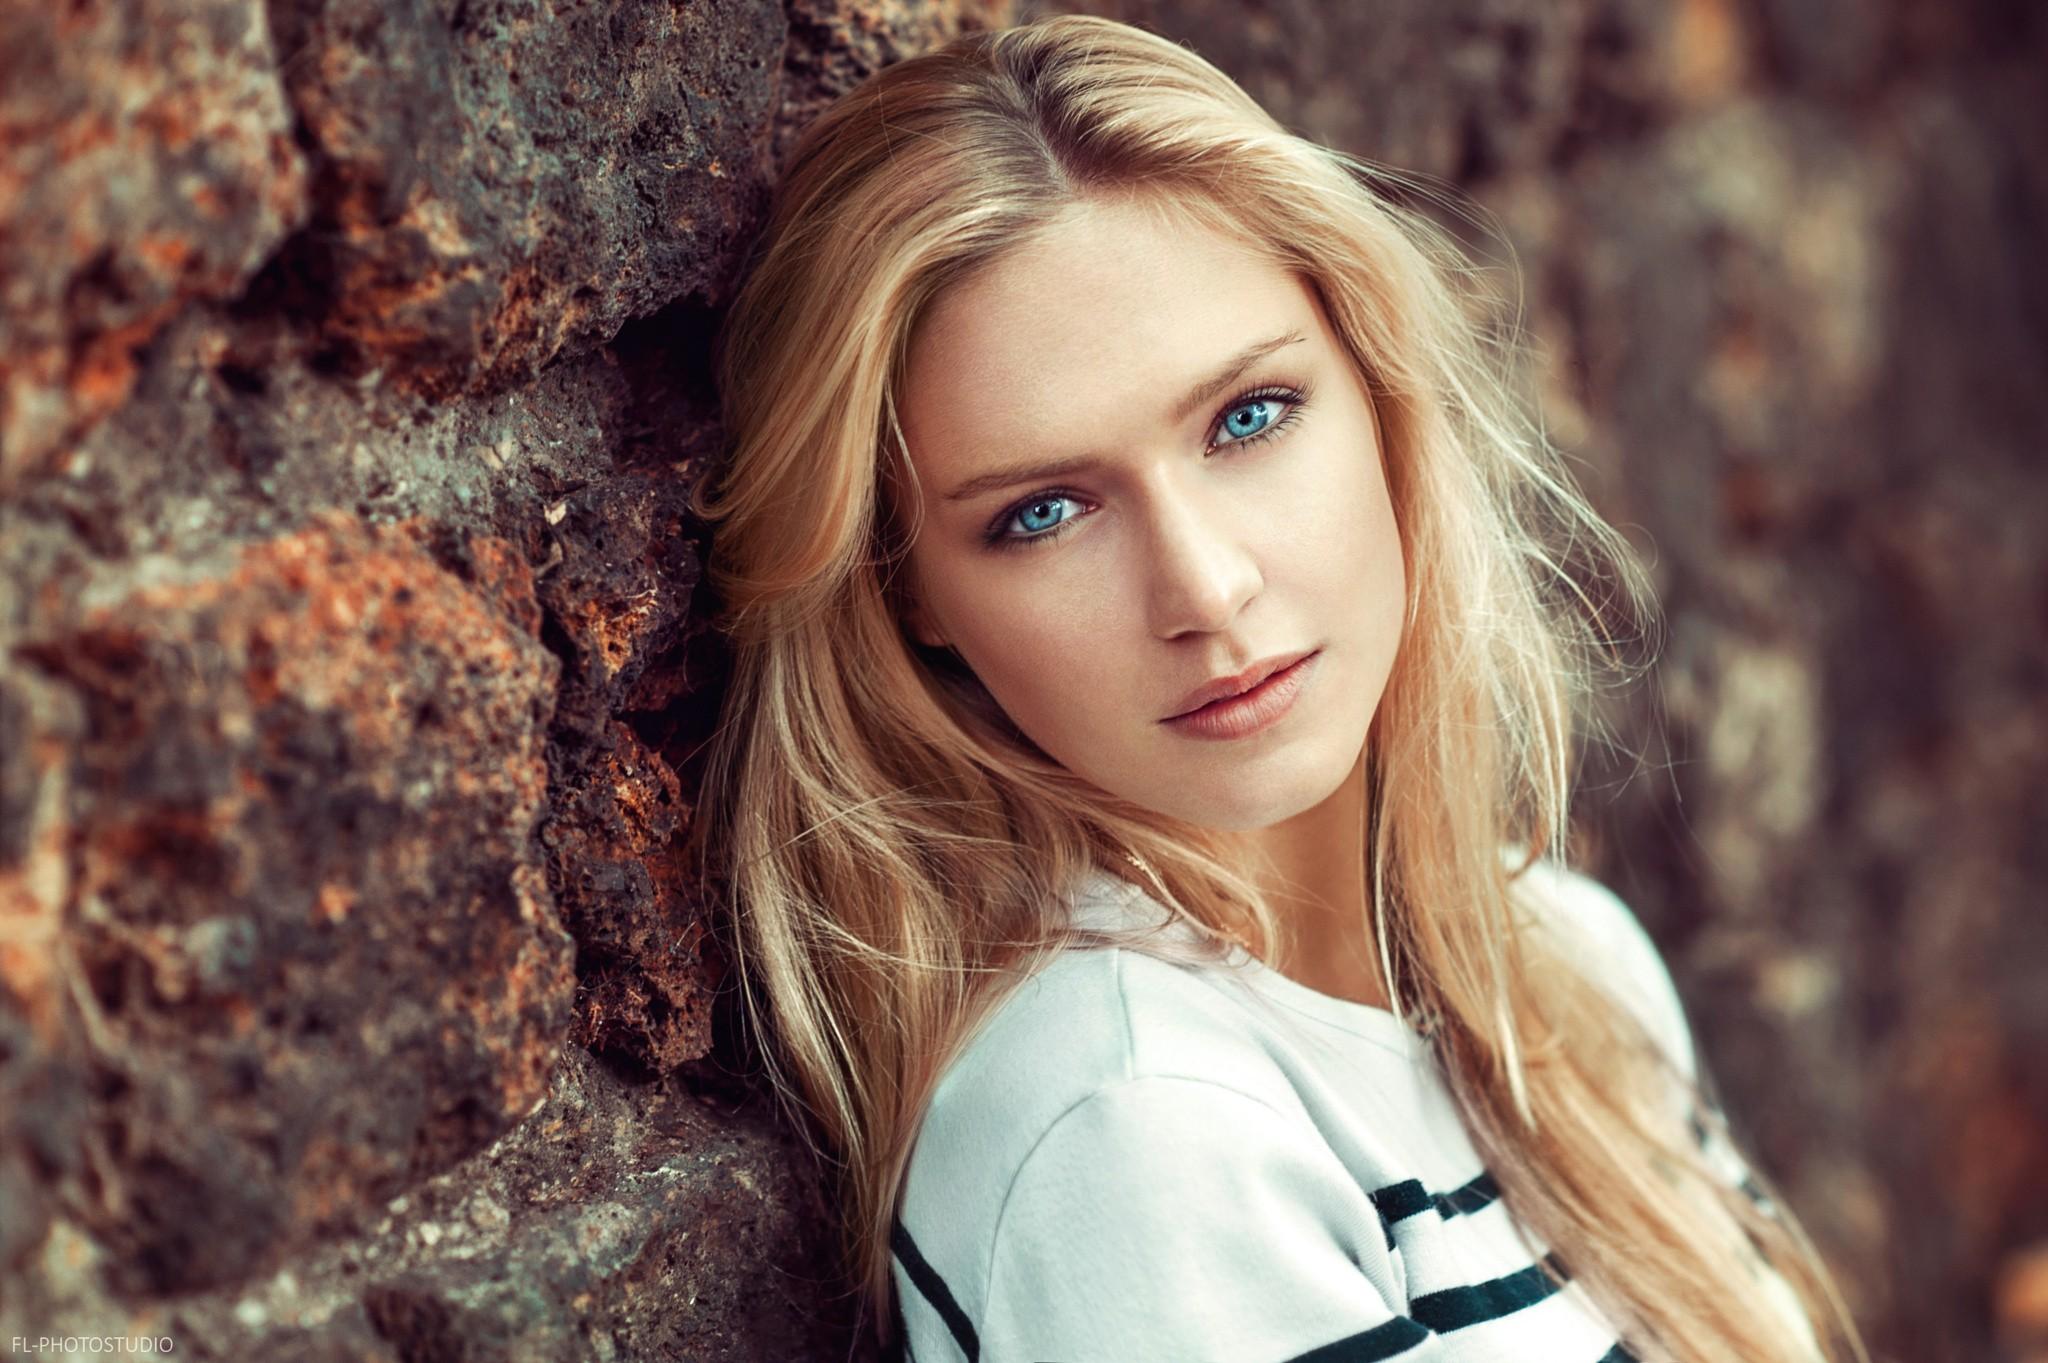 Wallpaper face women blonde depth of field long hair blue eyes looking at viewer eva - Beautiful model wallpaper ...